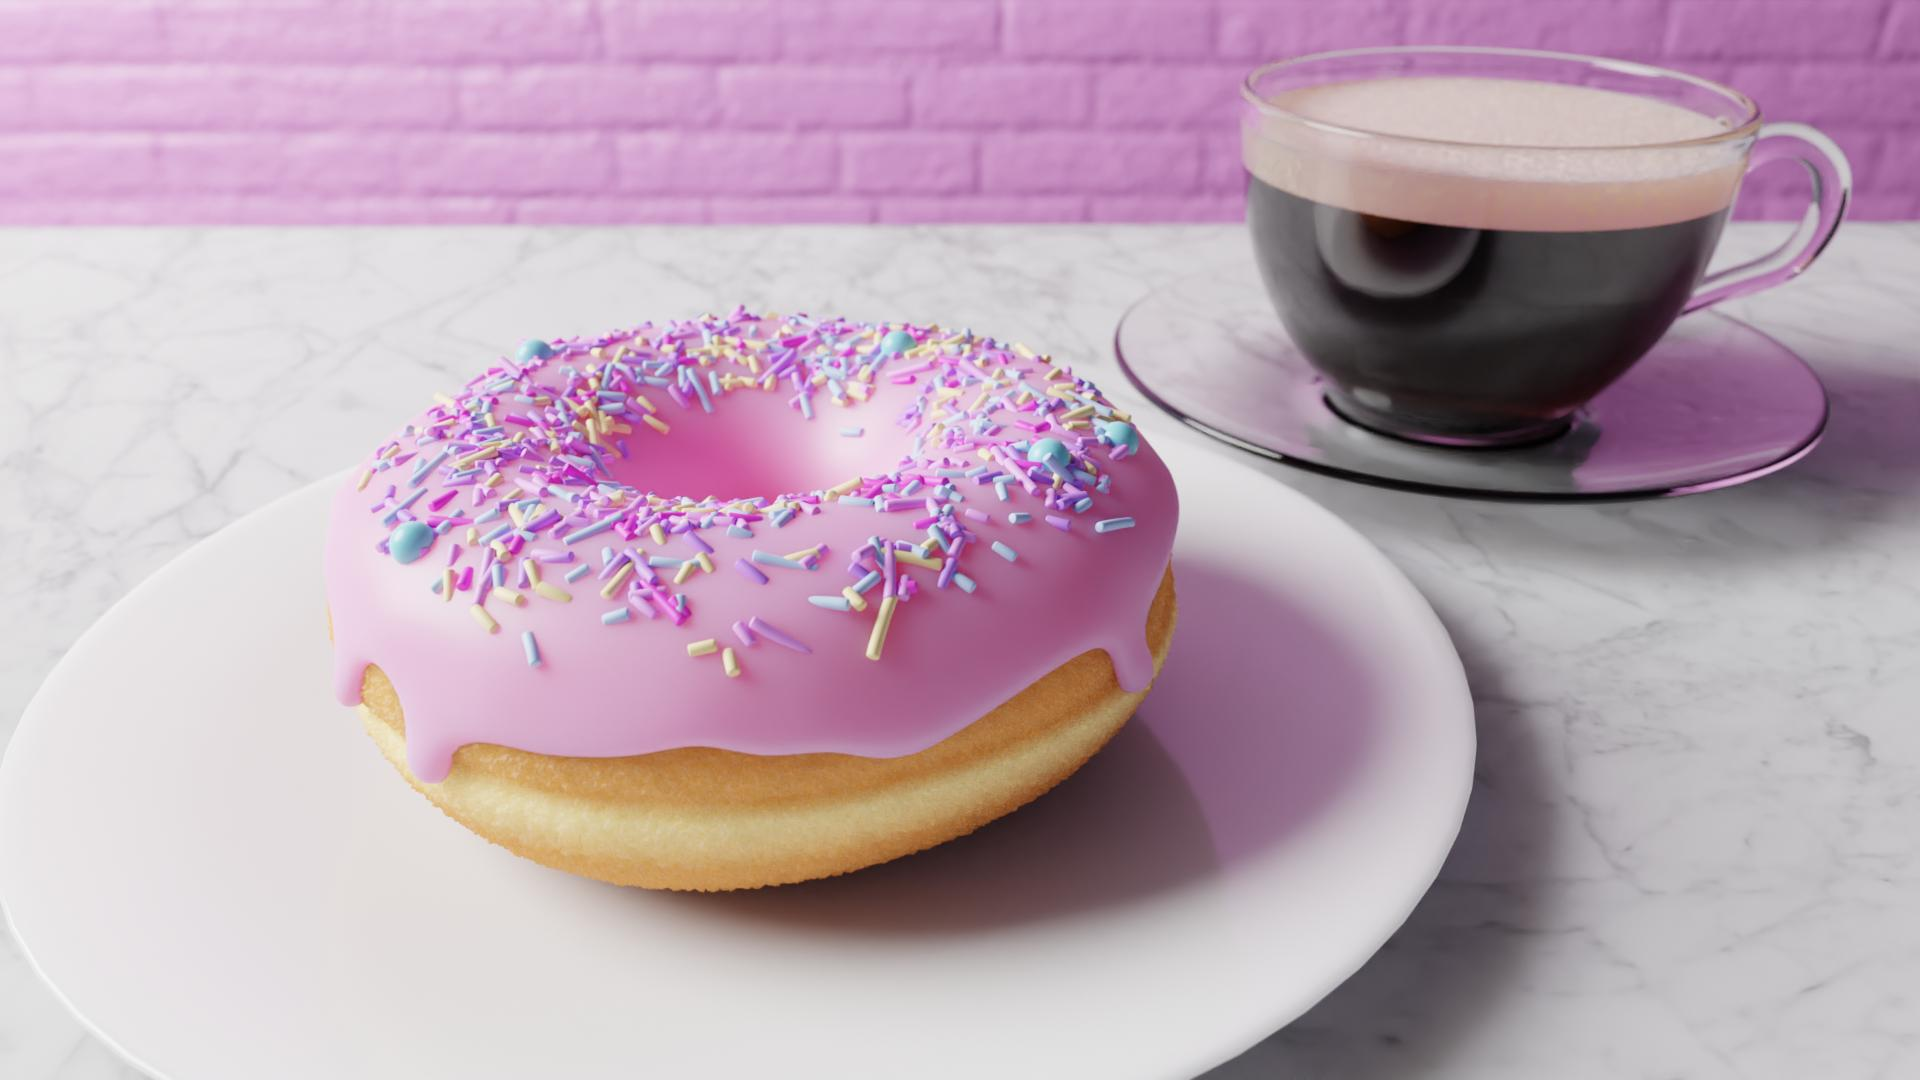 Tasty Donuts!